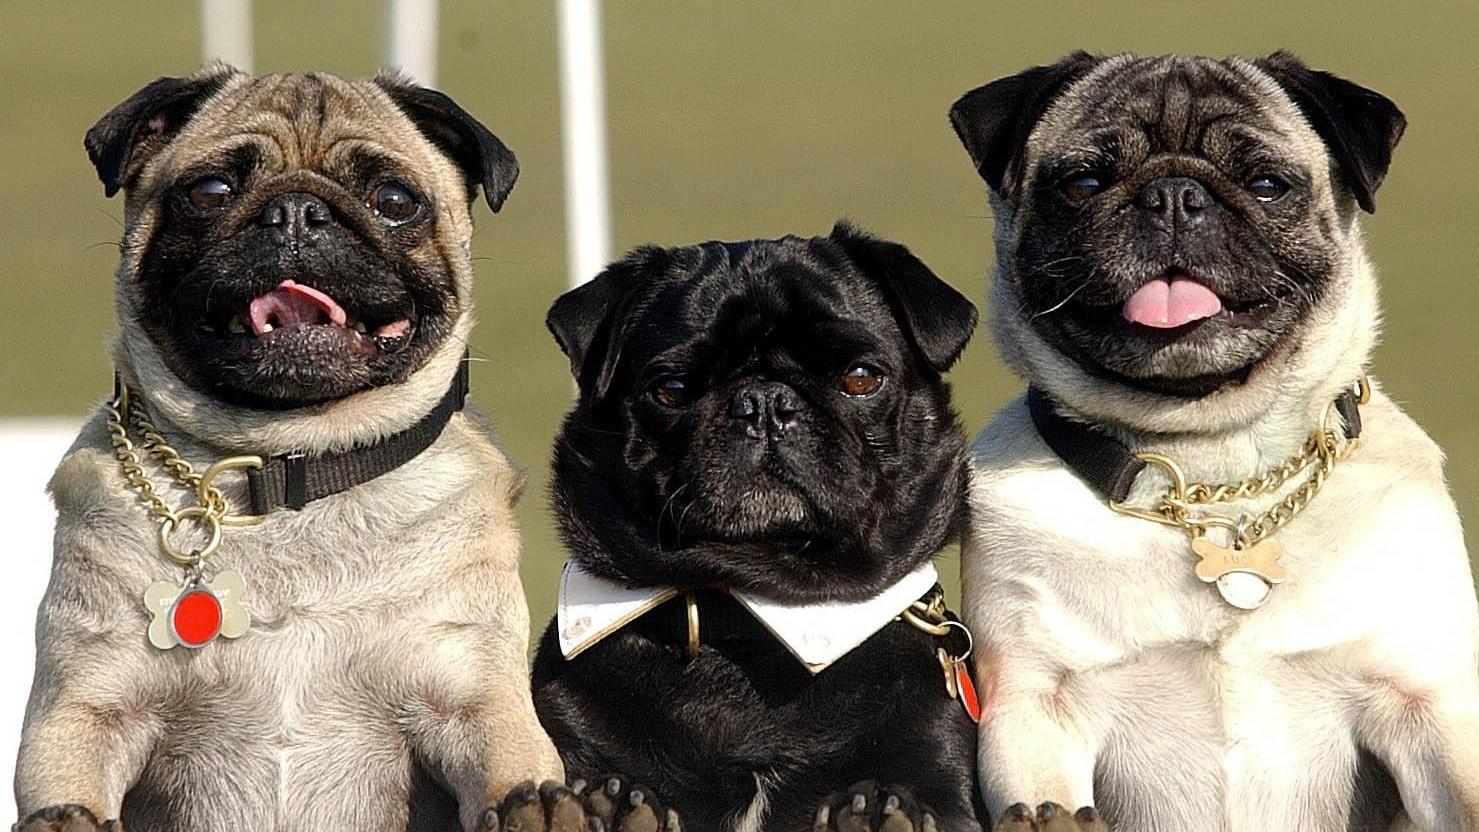 Pugs have seen a huge surge in popularity (David Jones/PA)